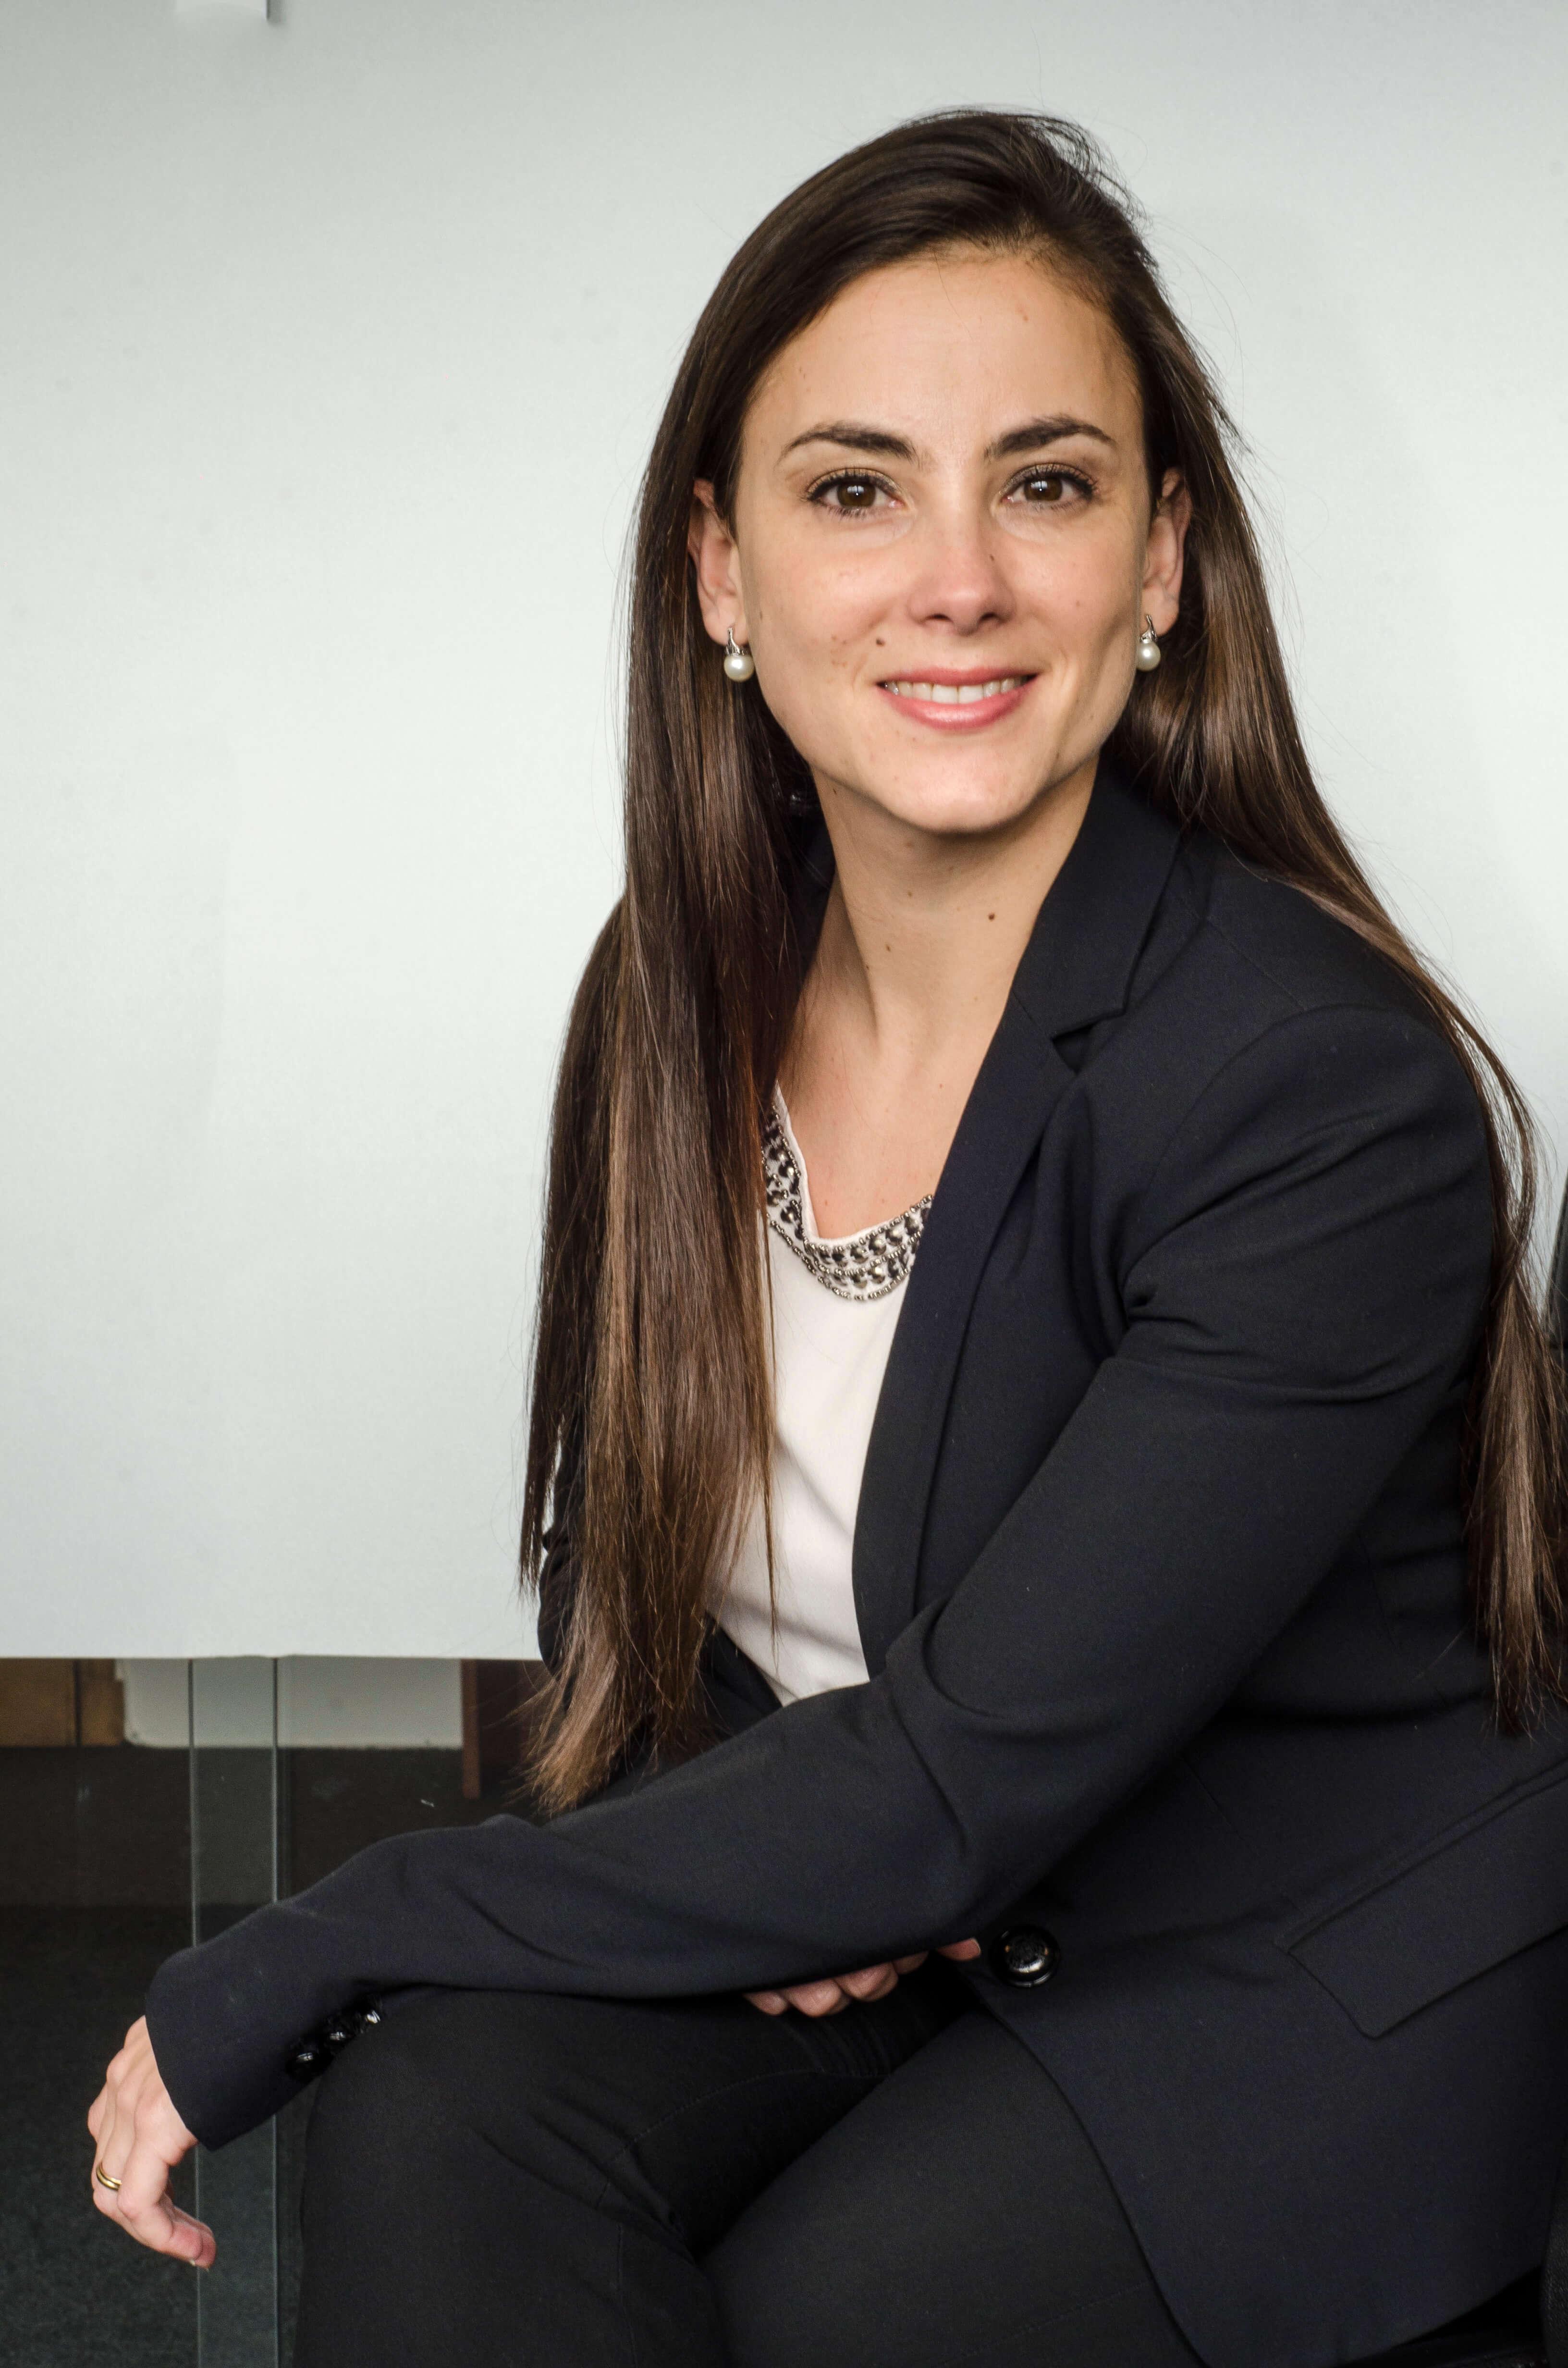 Dra. Agostina Cauterucci Aguilar